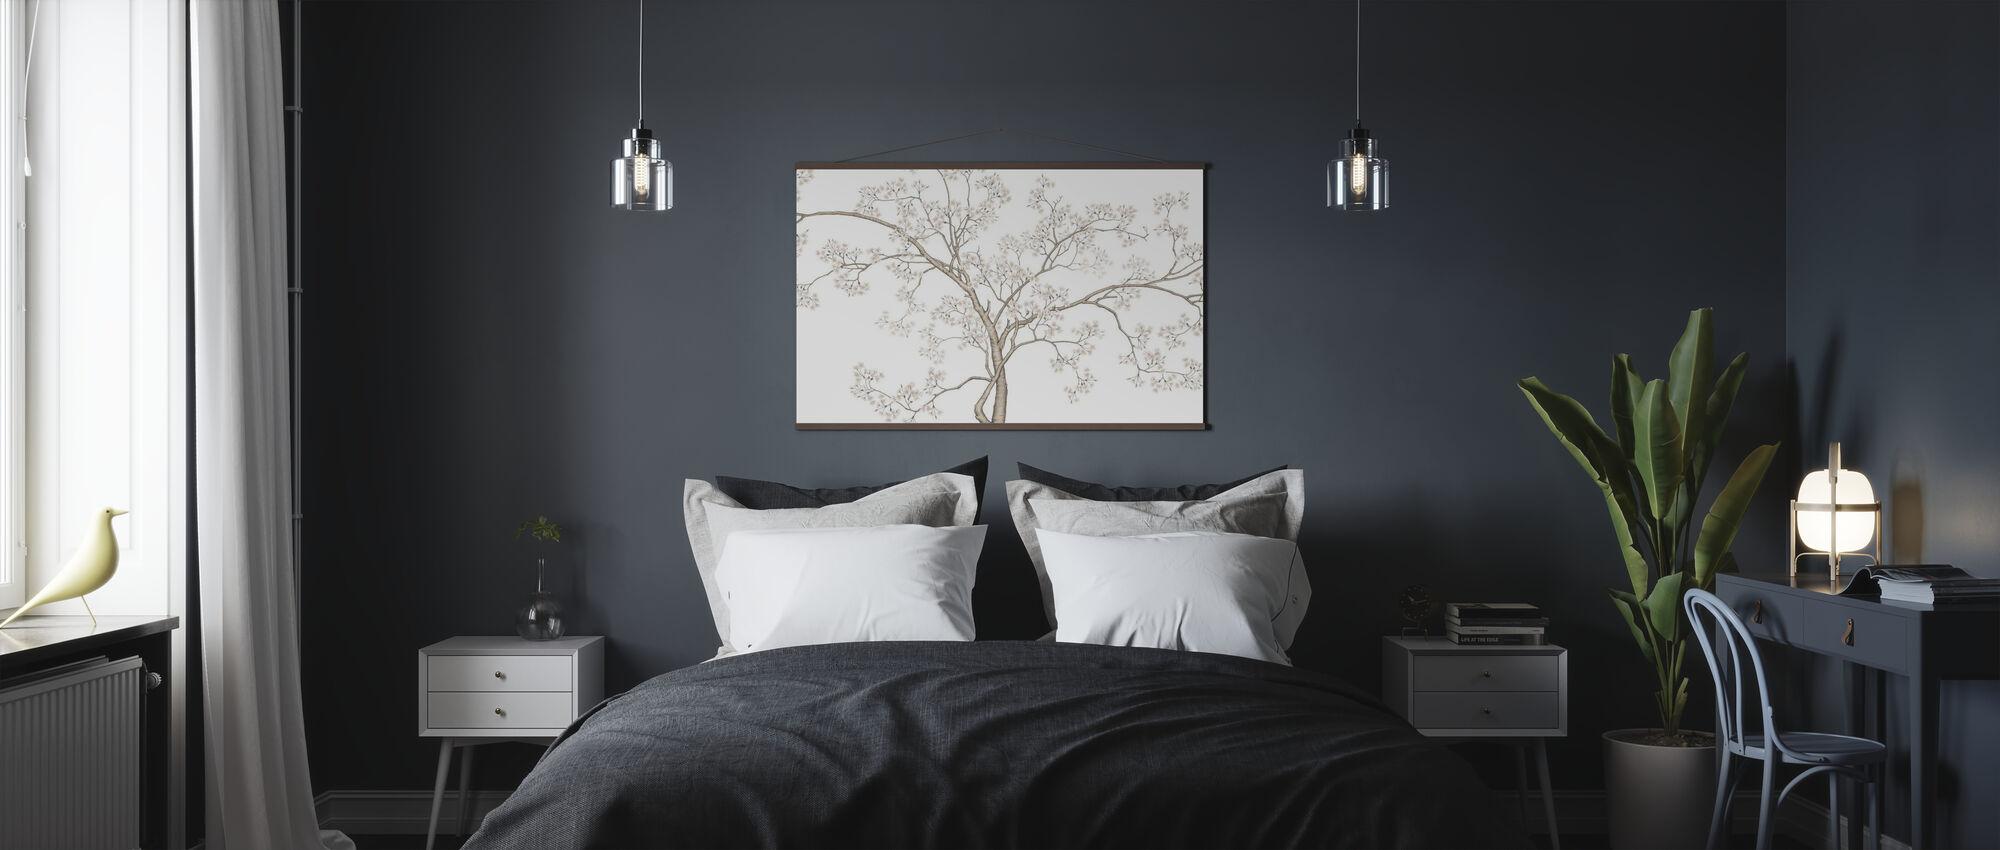 Puu - Juliste - Makuuhuone